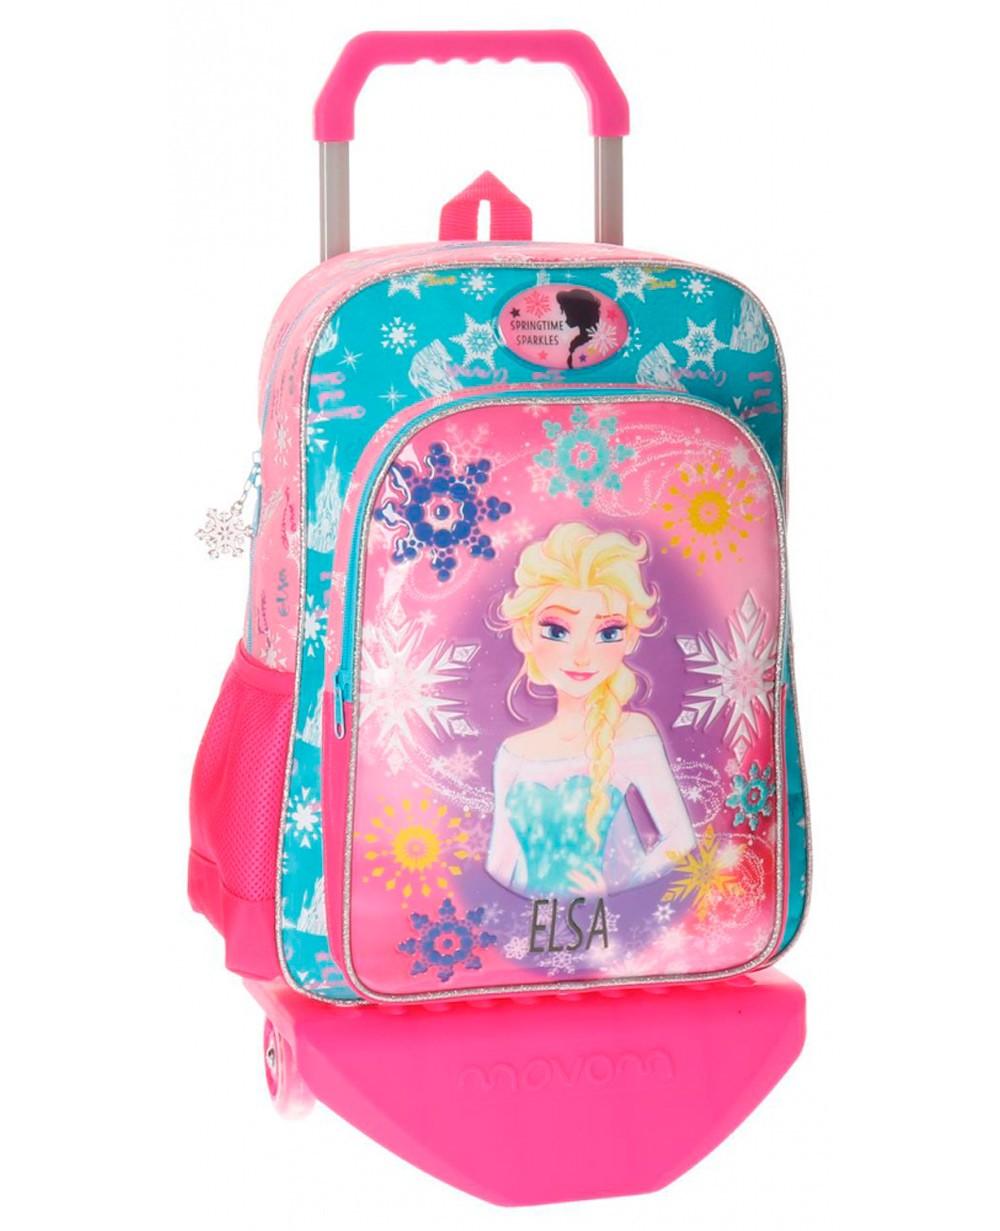 Disney Frozen Elsa mochila con carro Rosa (Foto )